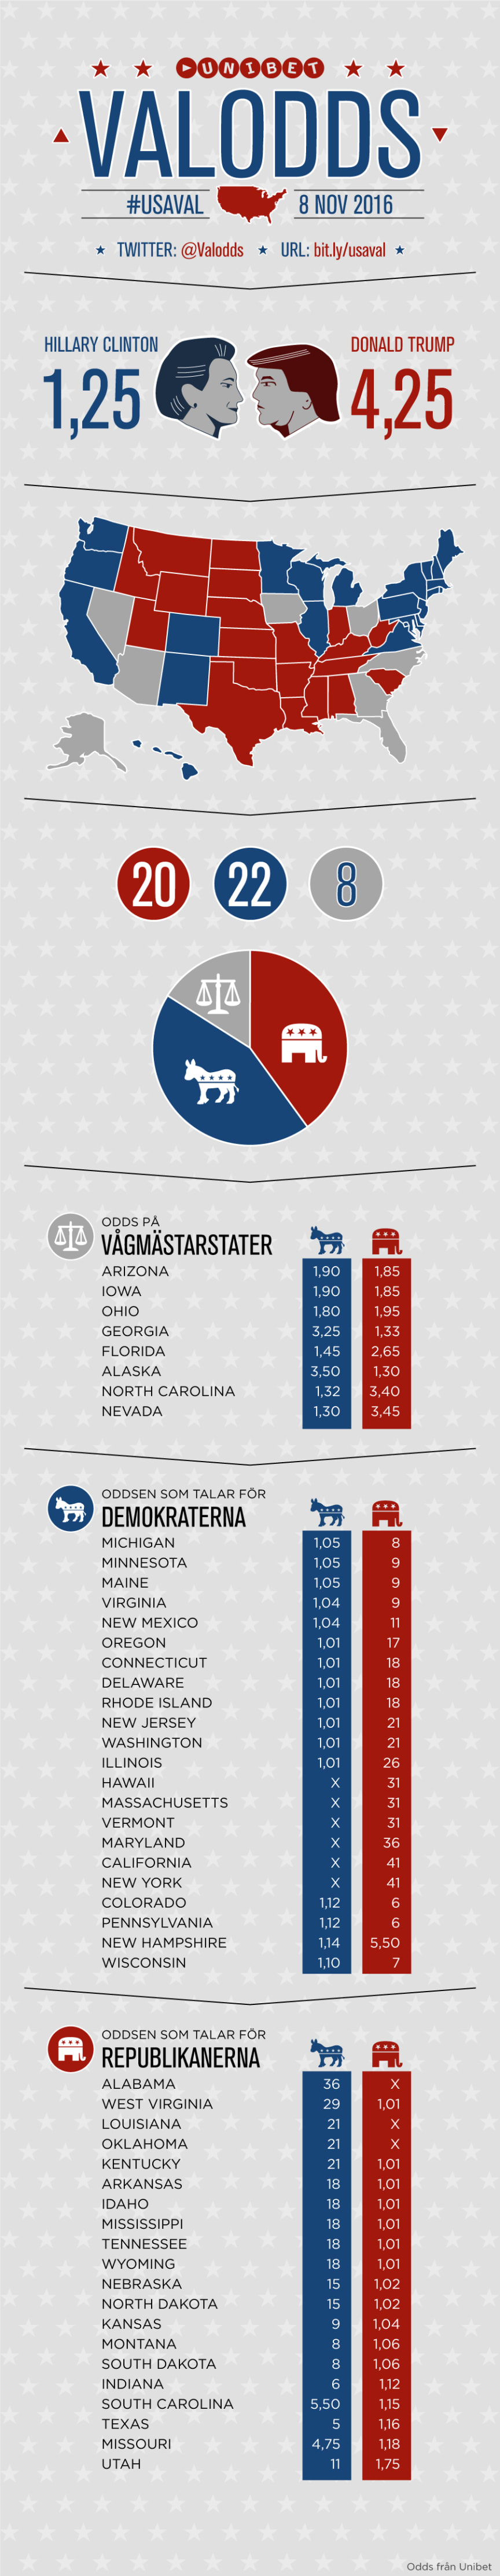 Grafik, presidentvalet